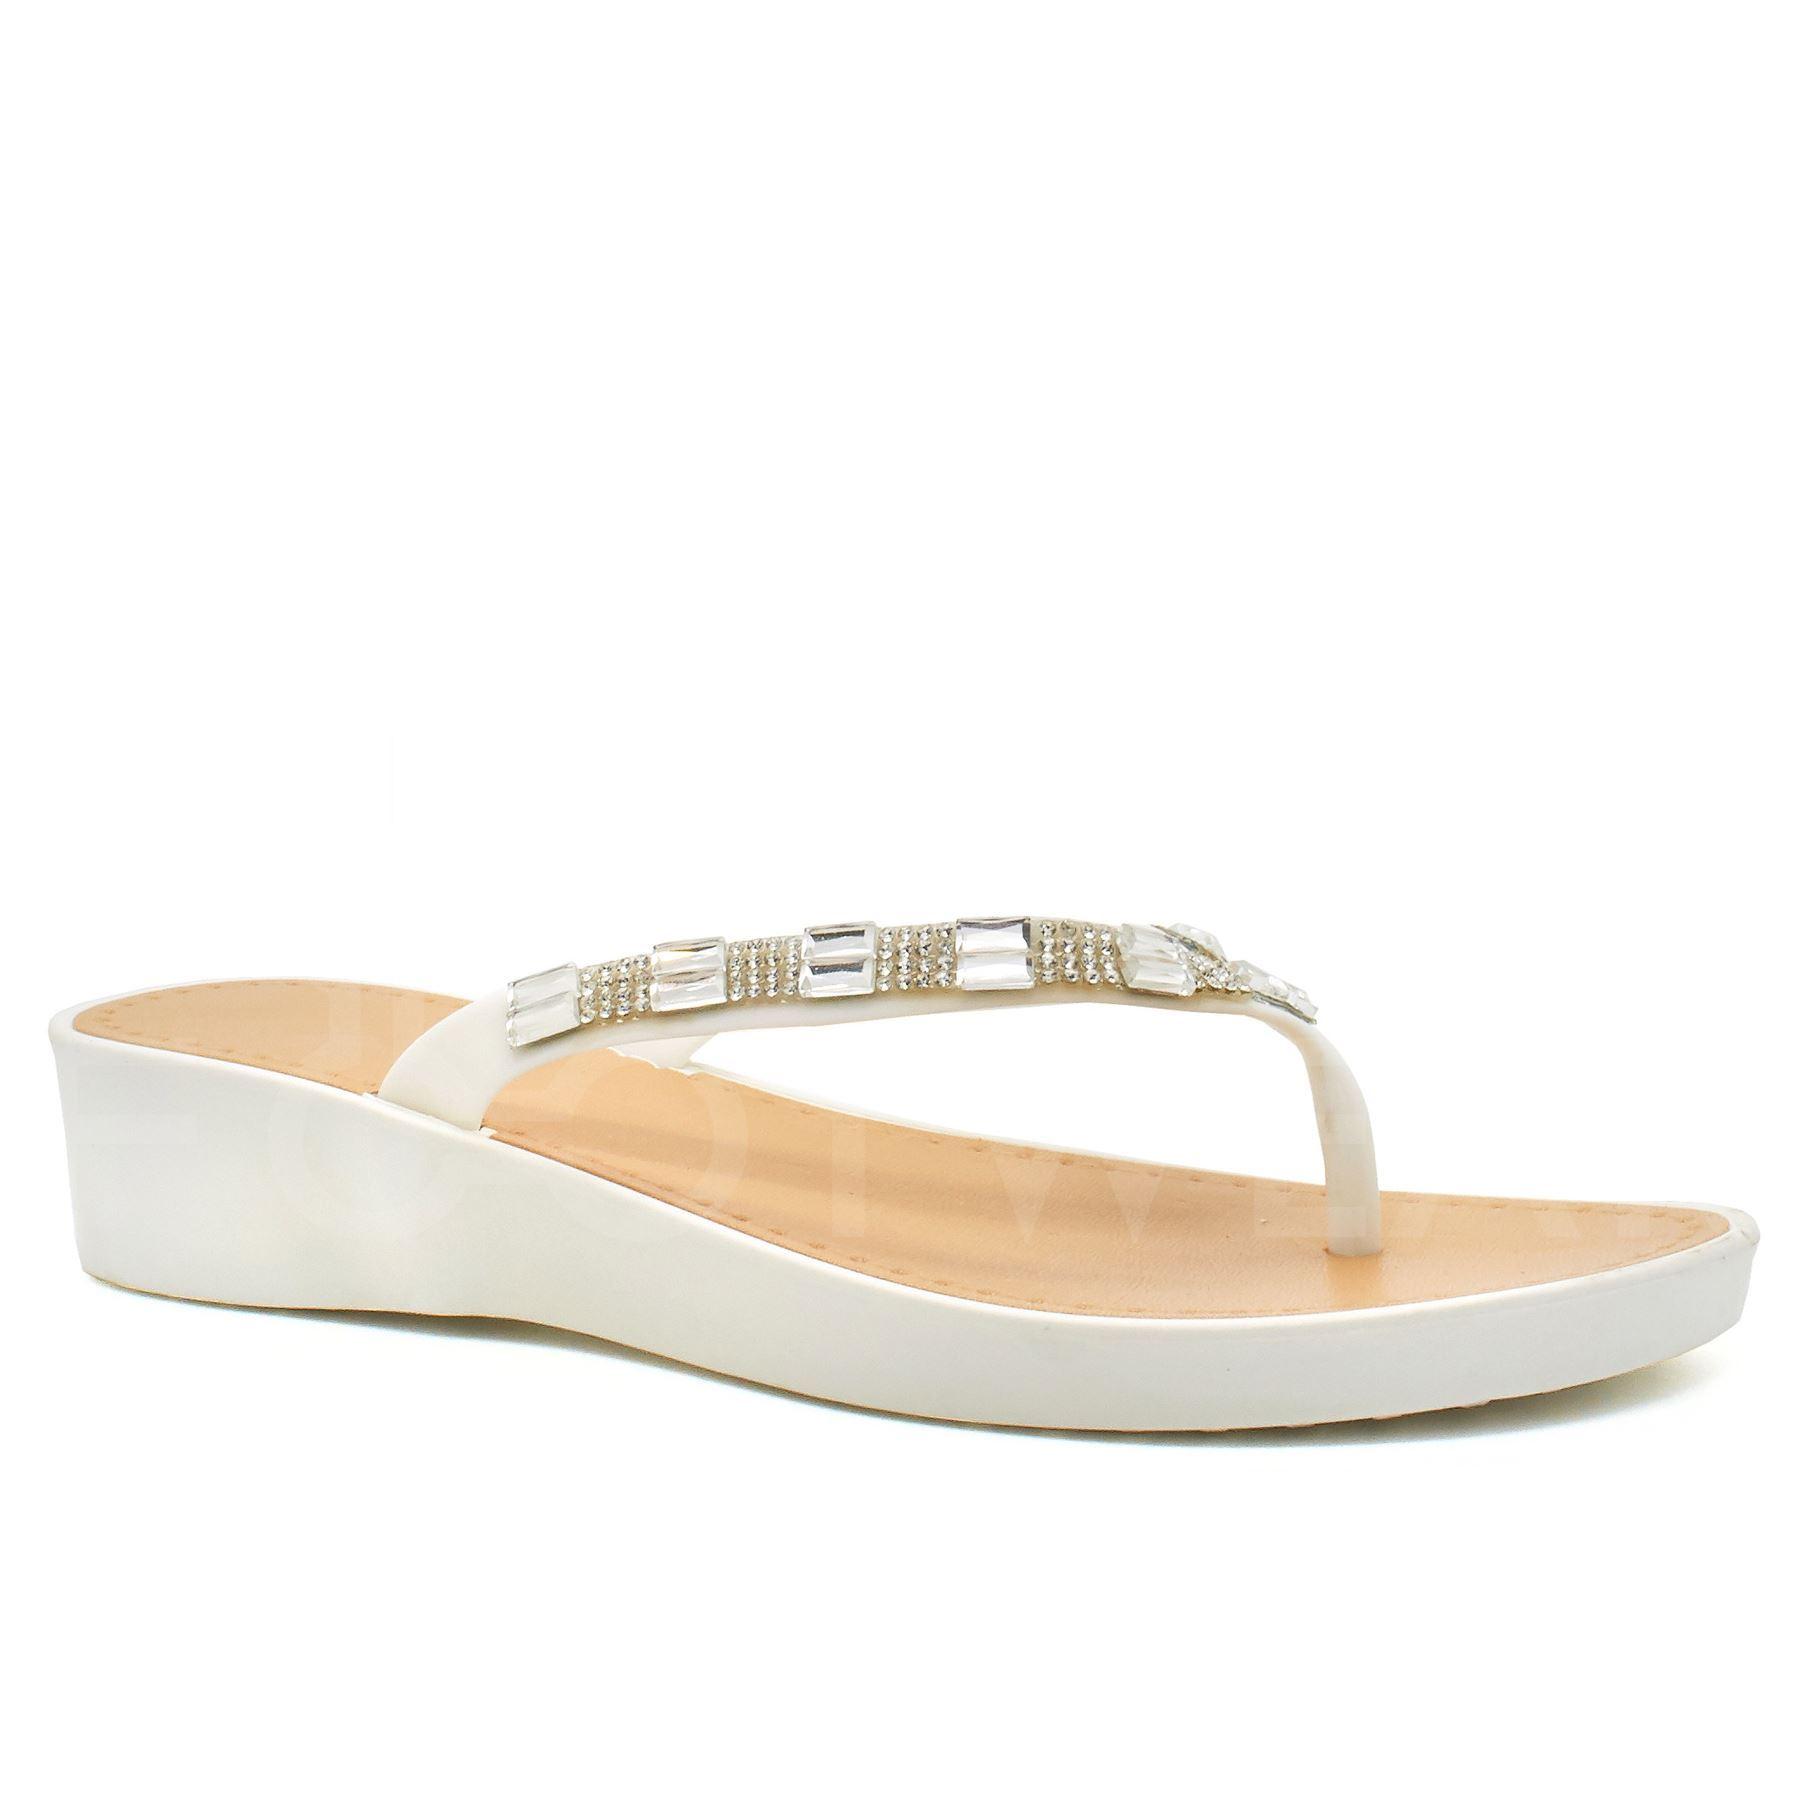 New Womens Low Wedge Heel Sandals Ladies Diamante Flip -6089